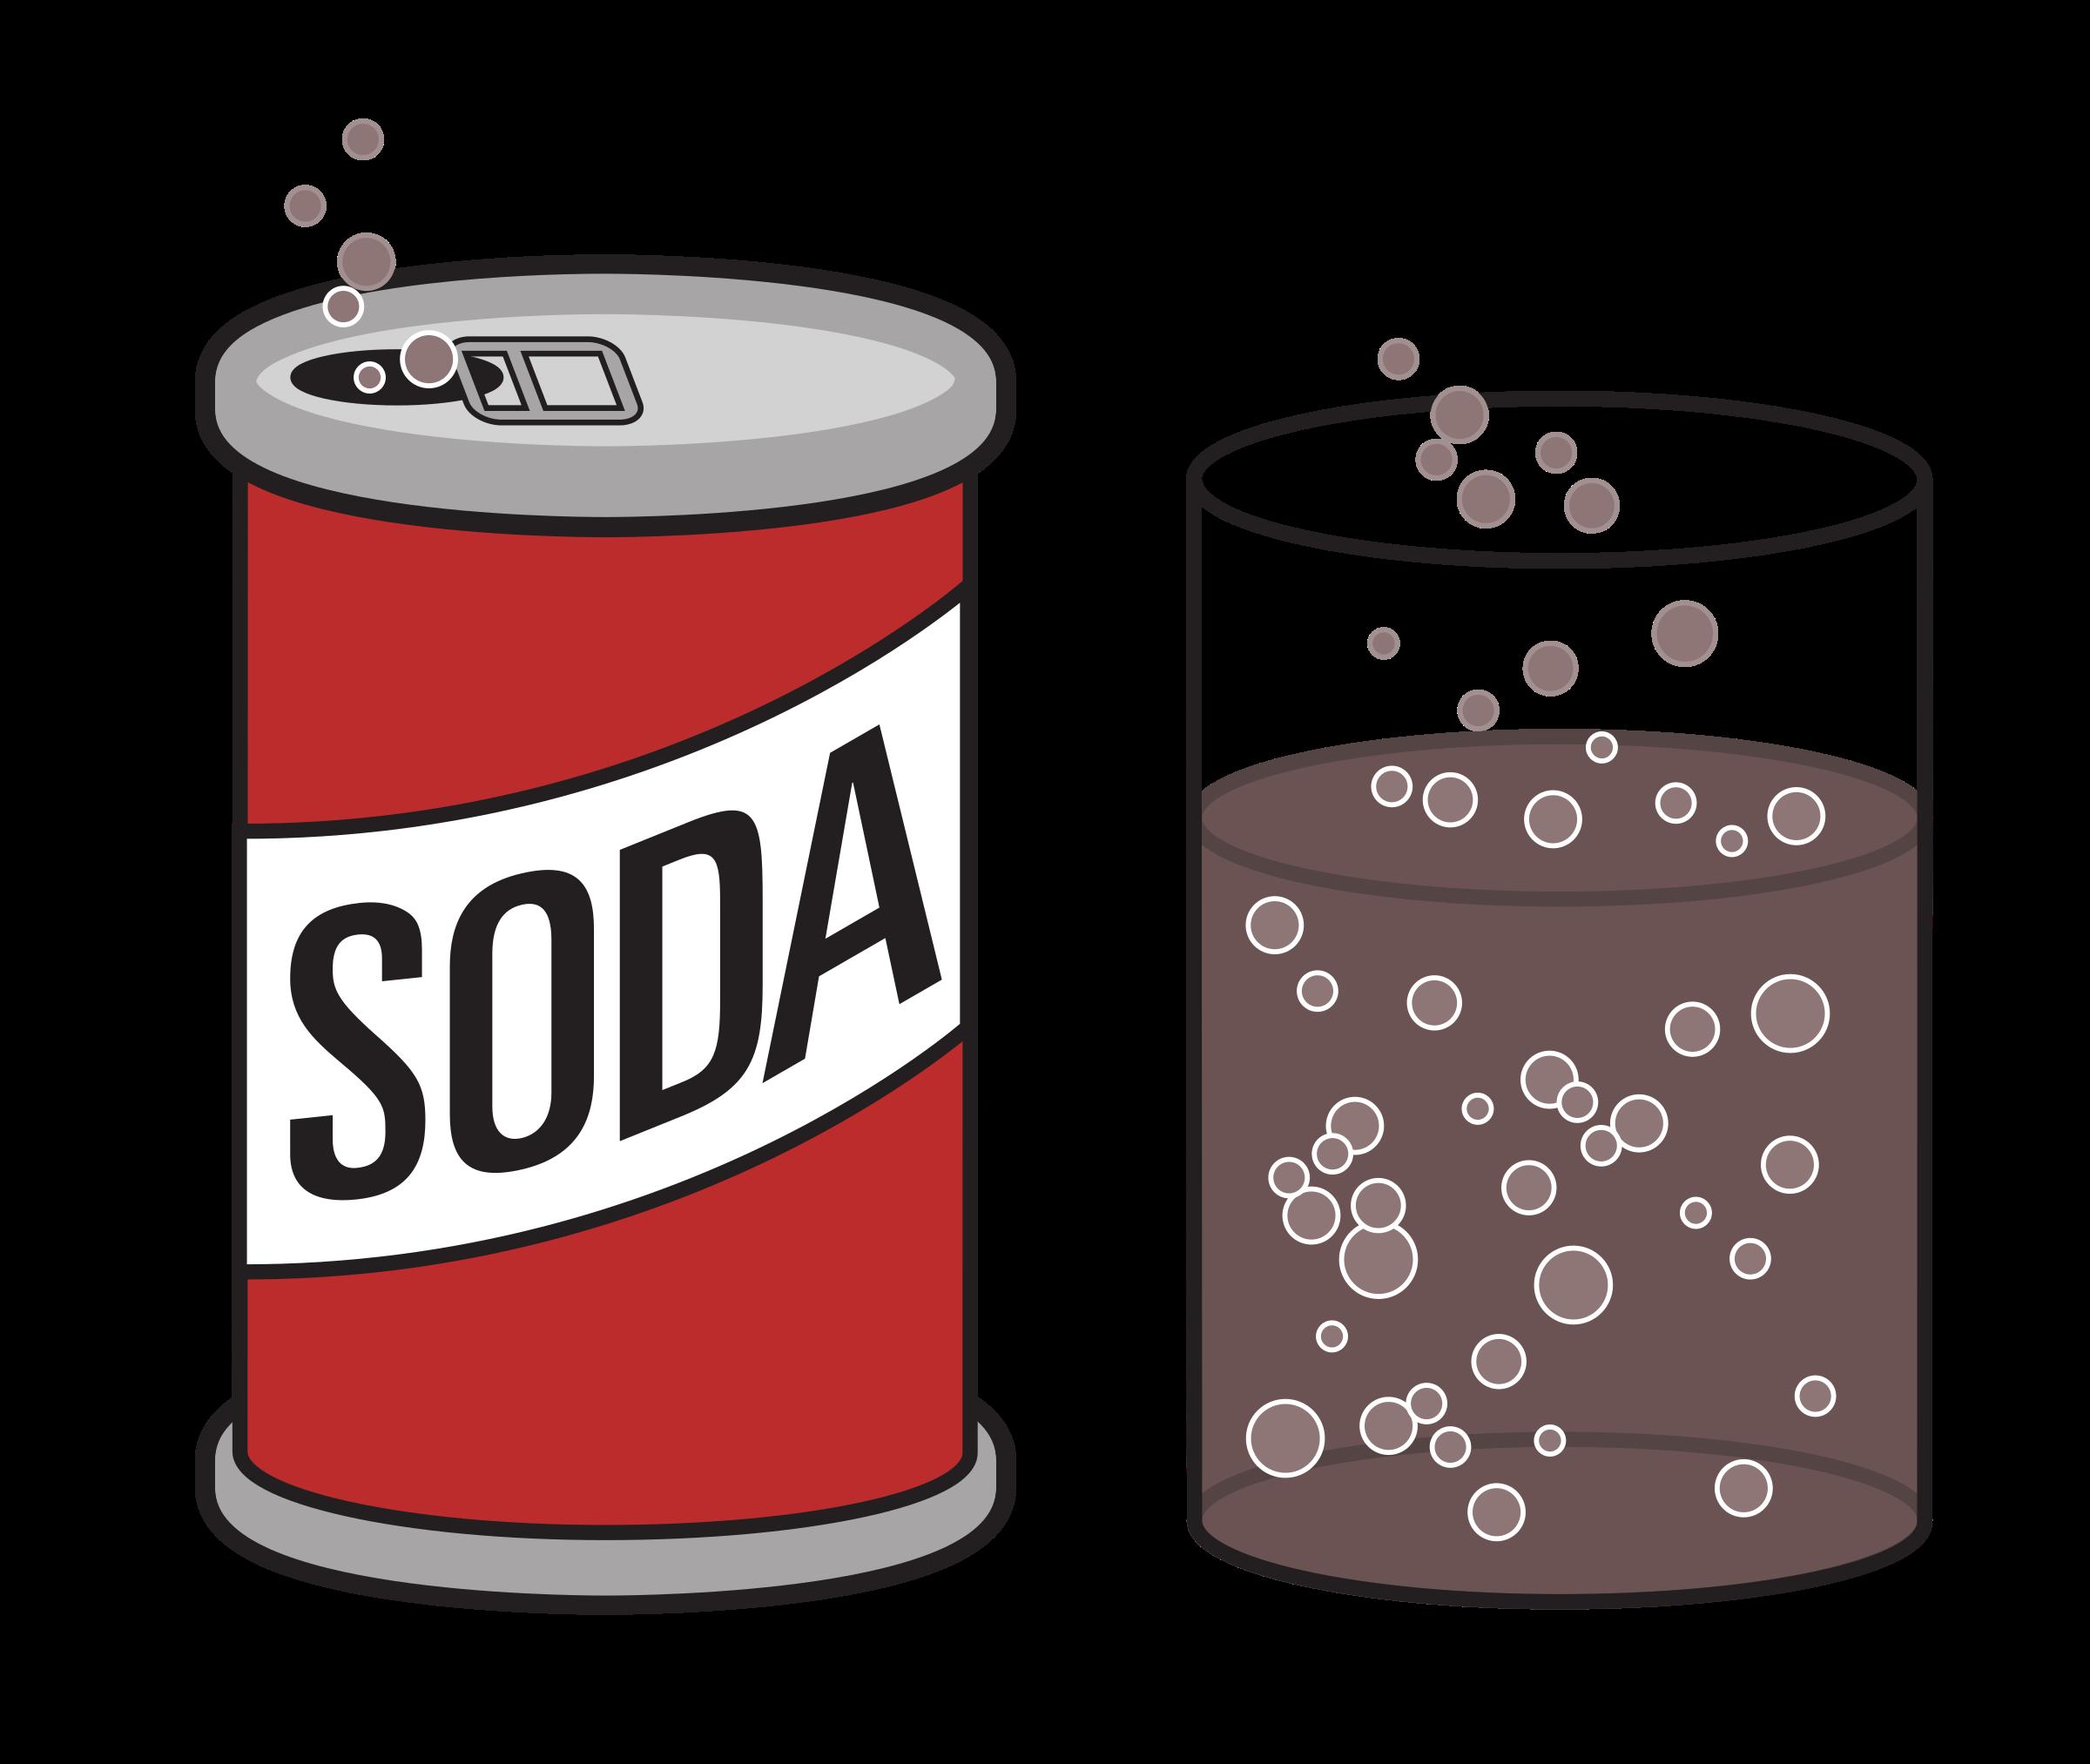 Kawaii clipart soda, Kawaii soda Transparent FREE for